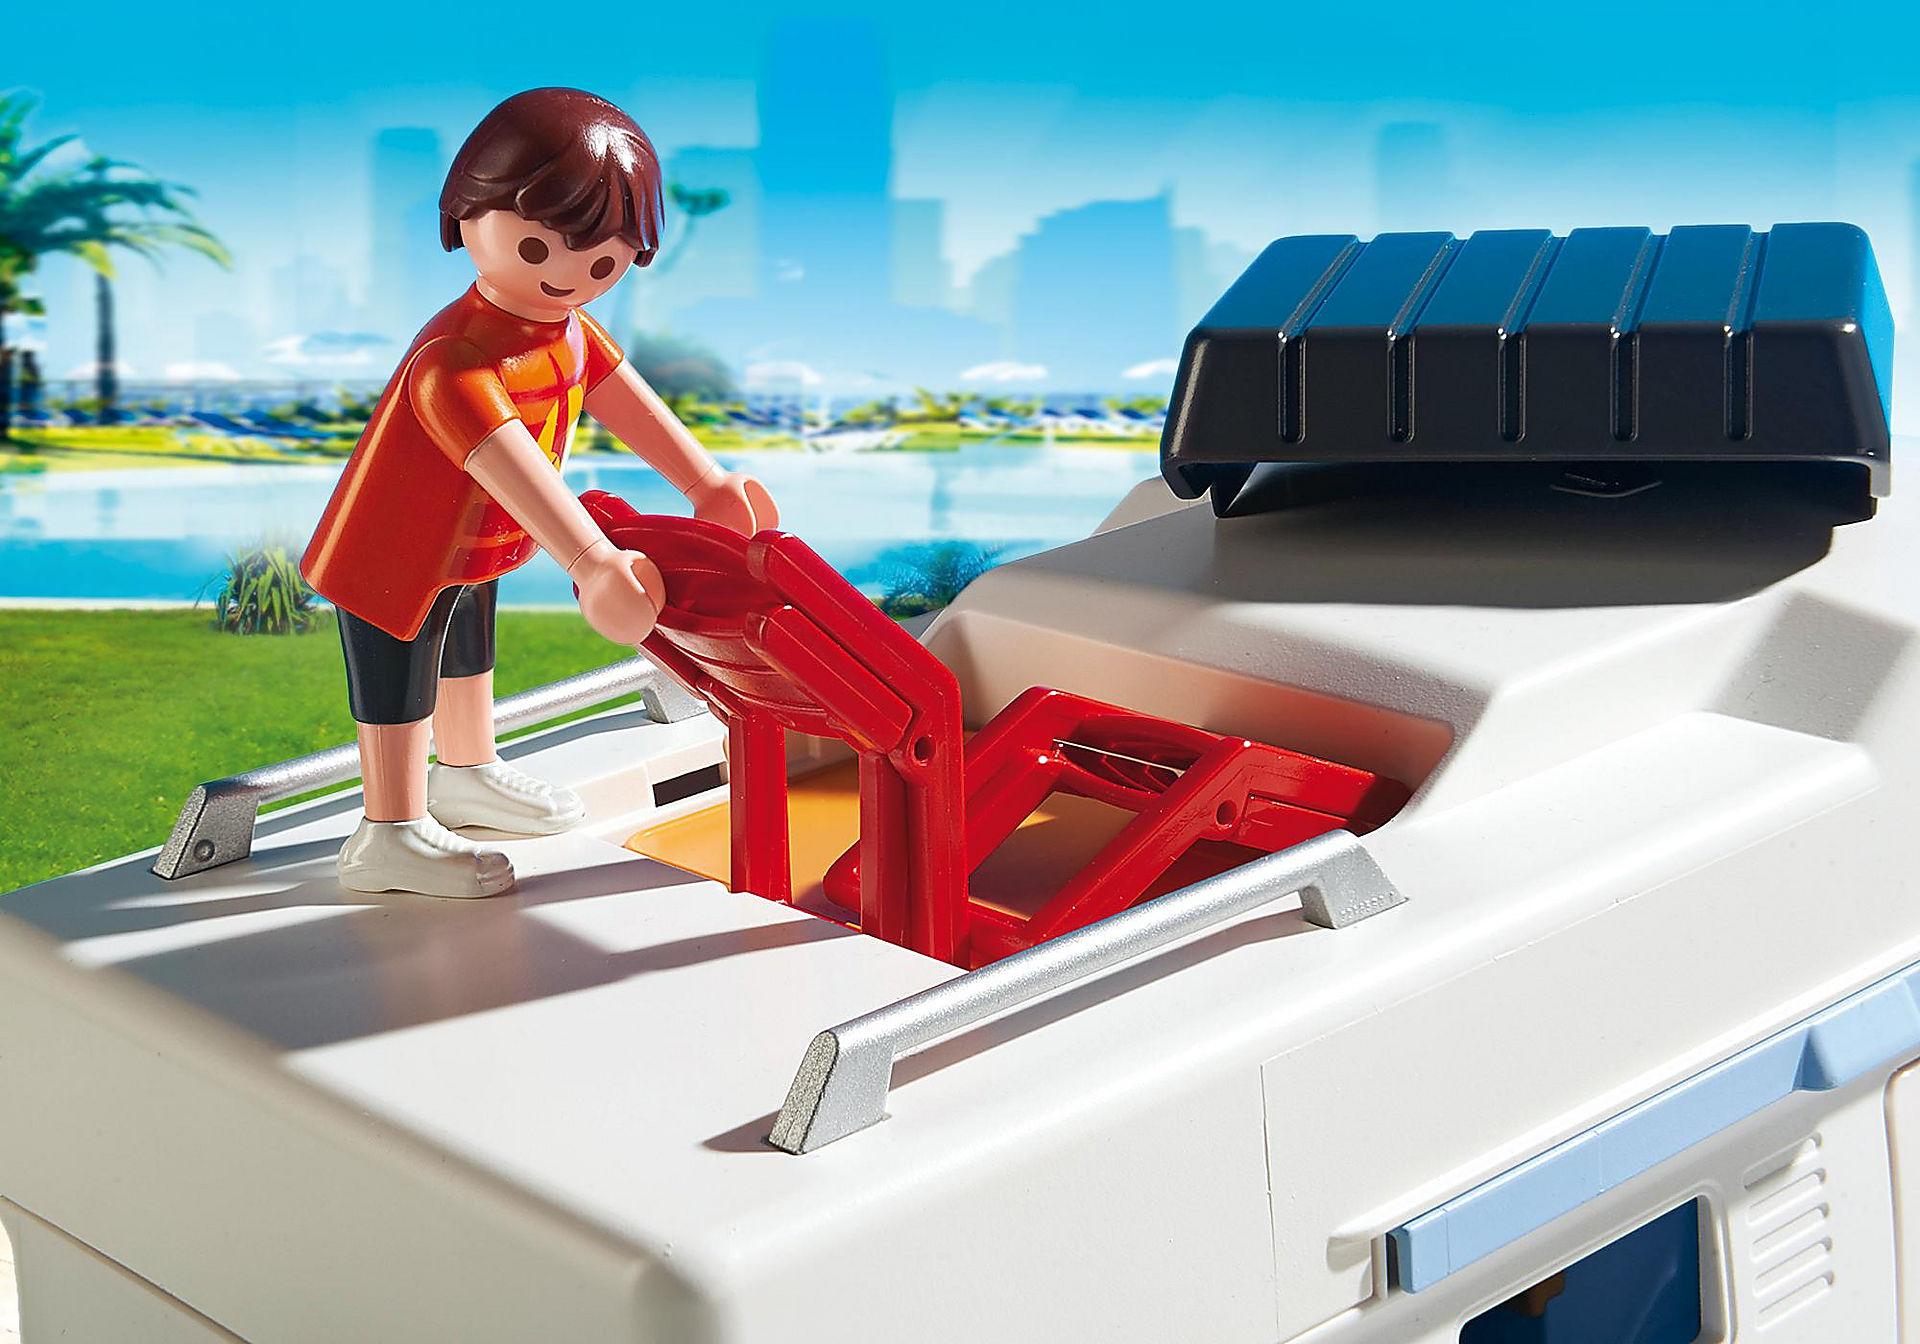 http://media.playmobil.com/i/playmobil/6671_product_extra2/Οικογενειακό τροχόσπιτο